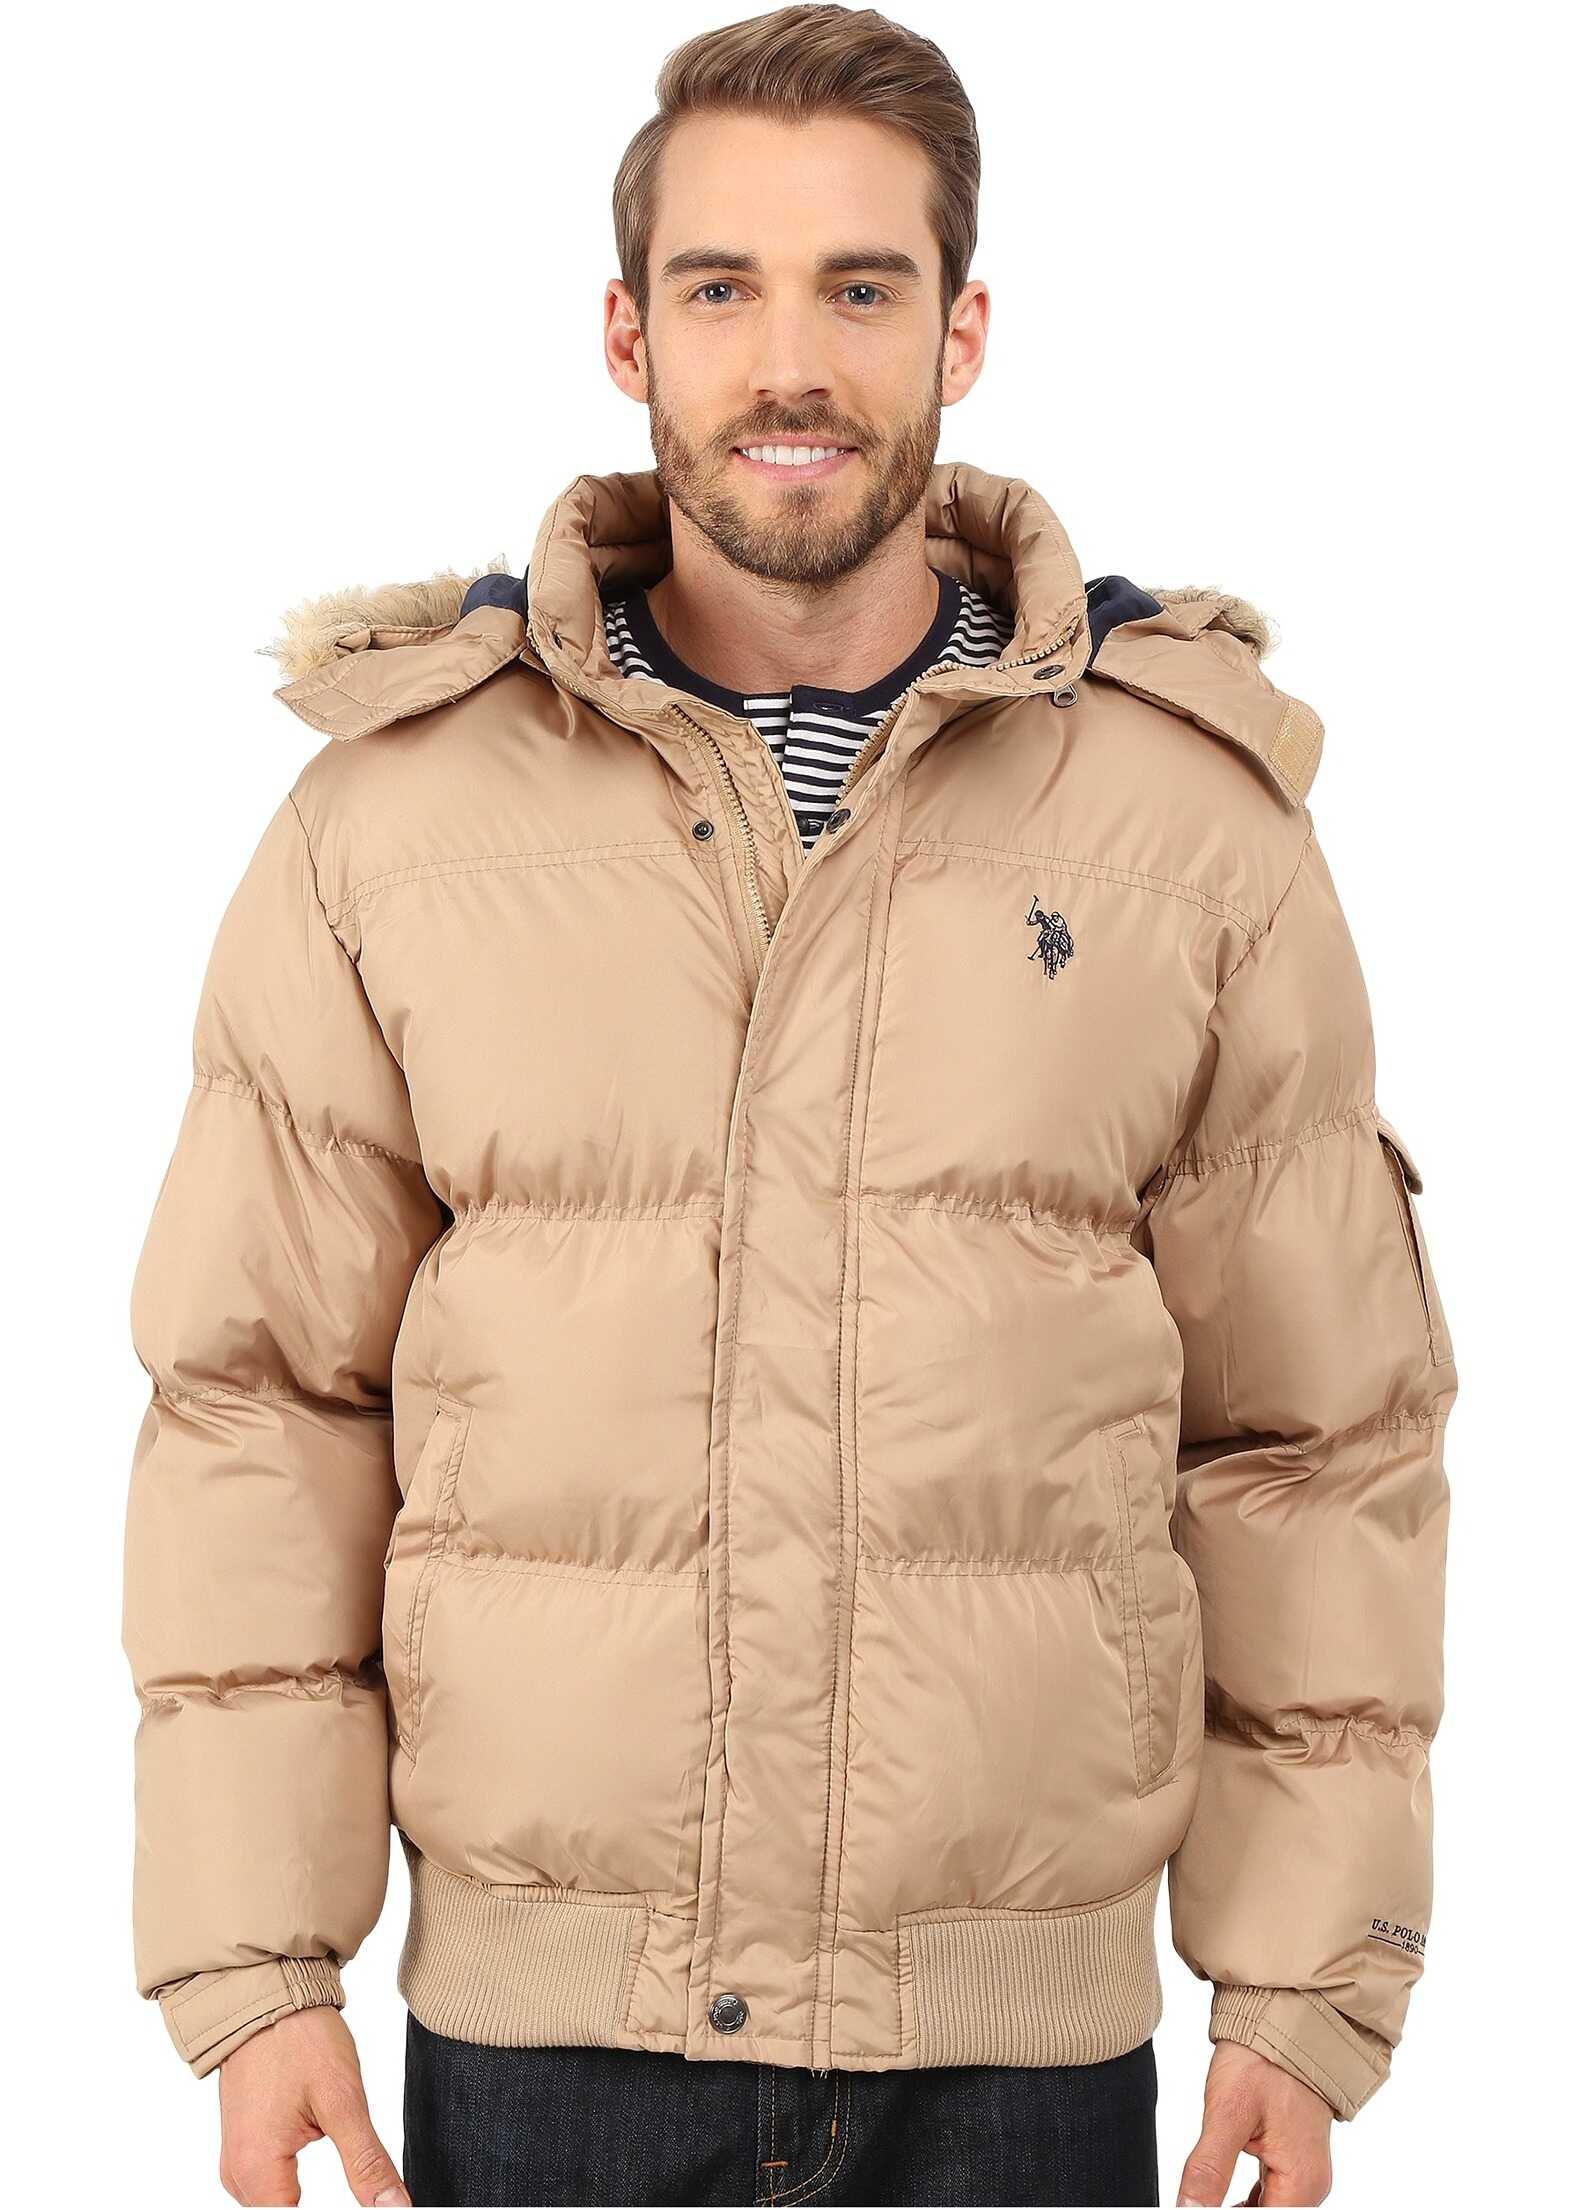 U.S. POLO ASSN. Short Snorkel Jacket Desert Khaki